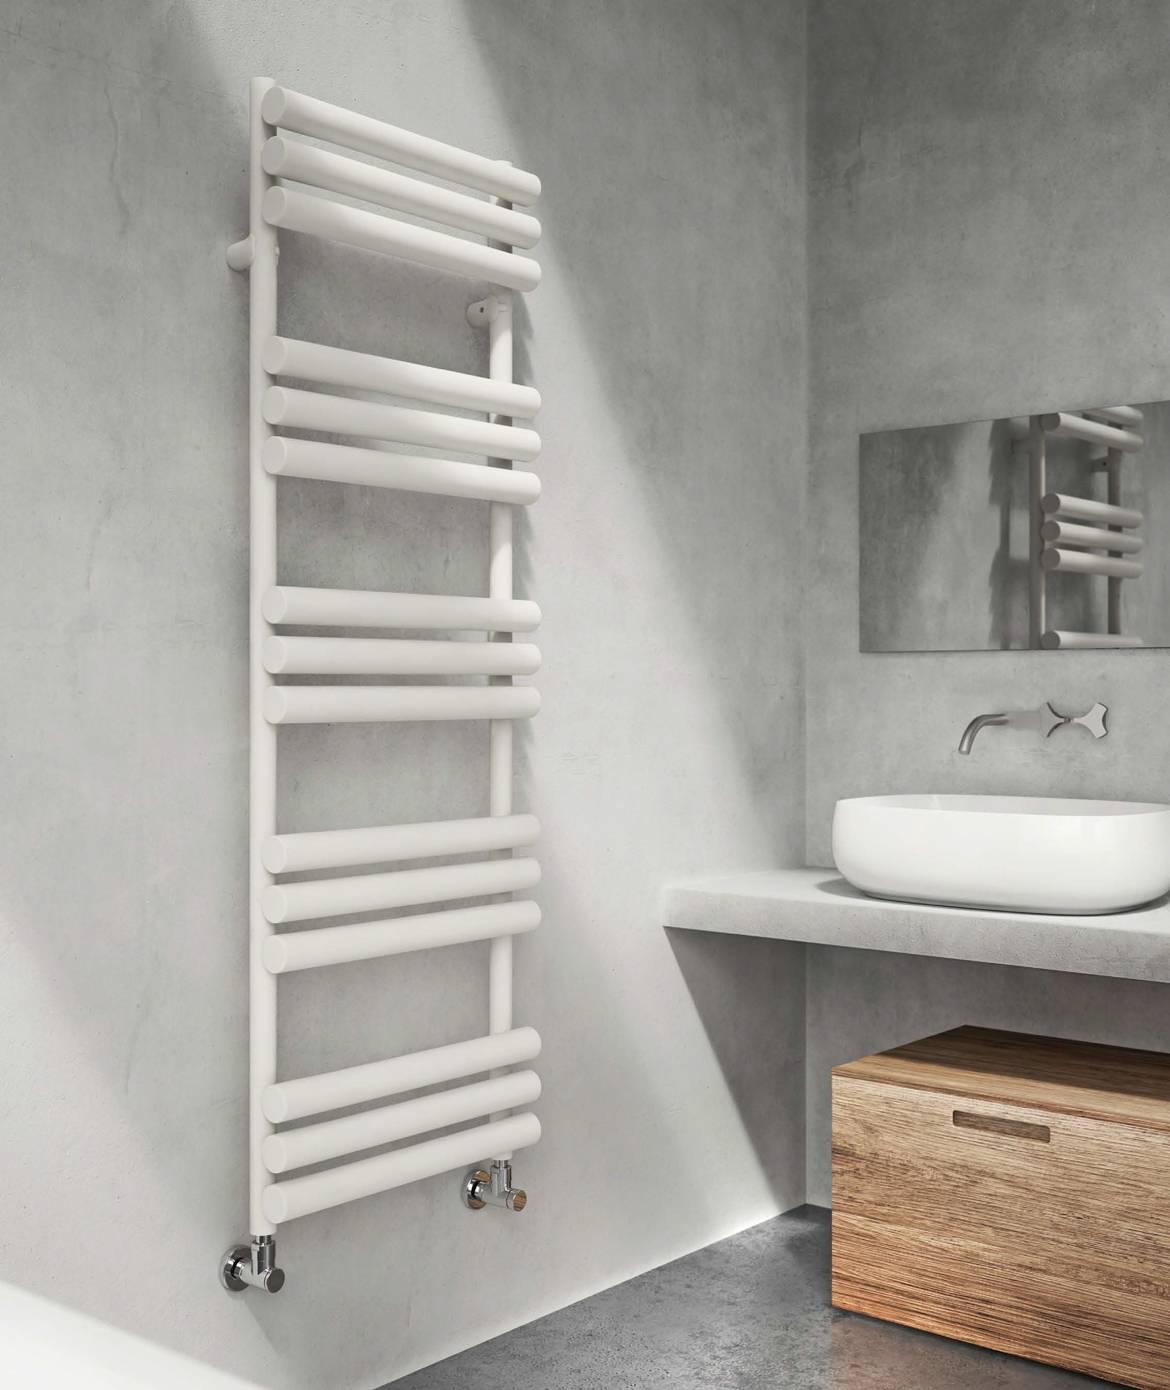 Graziano-seche-serviettes-radiateurs osaka-vertical